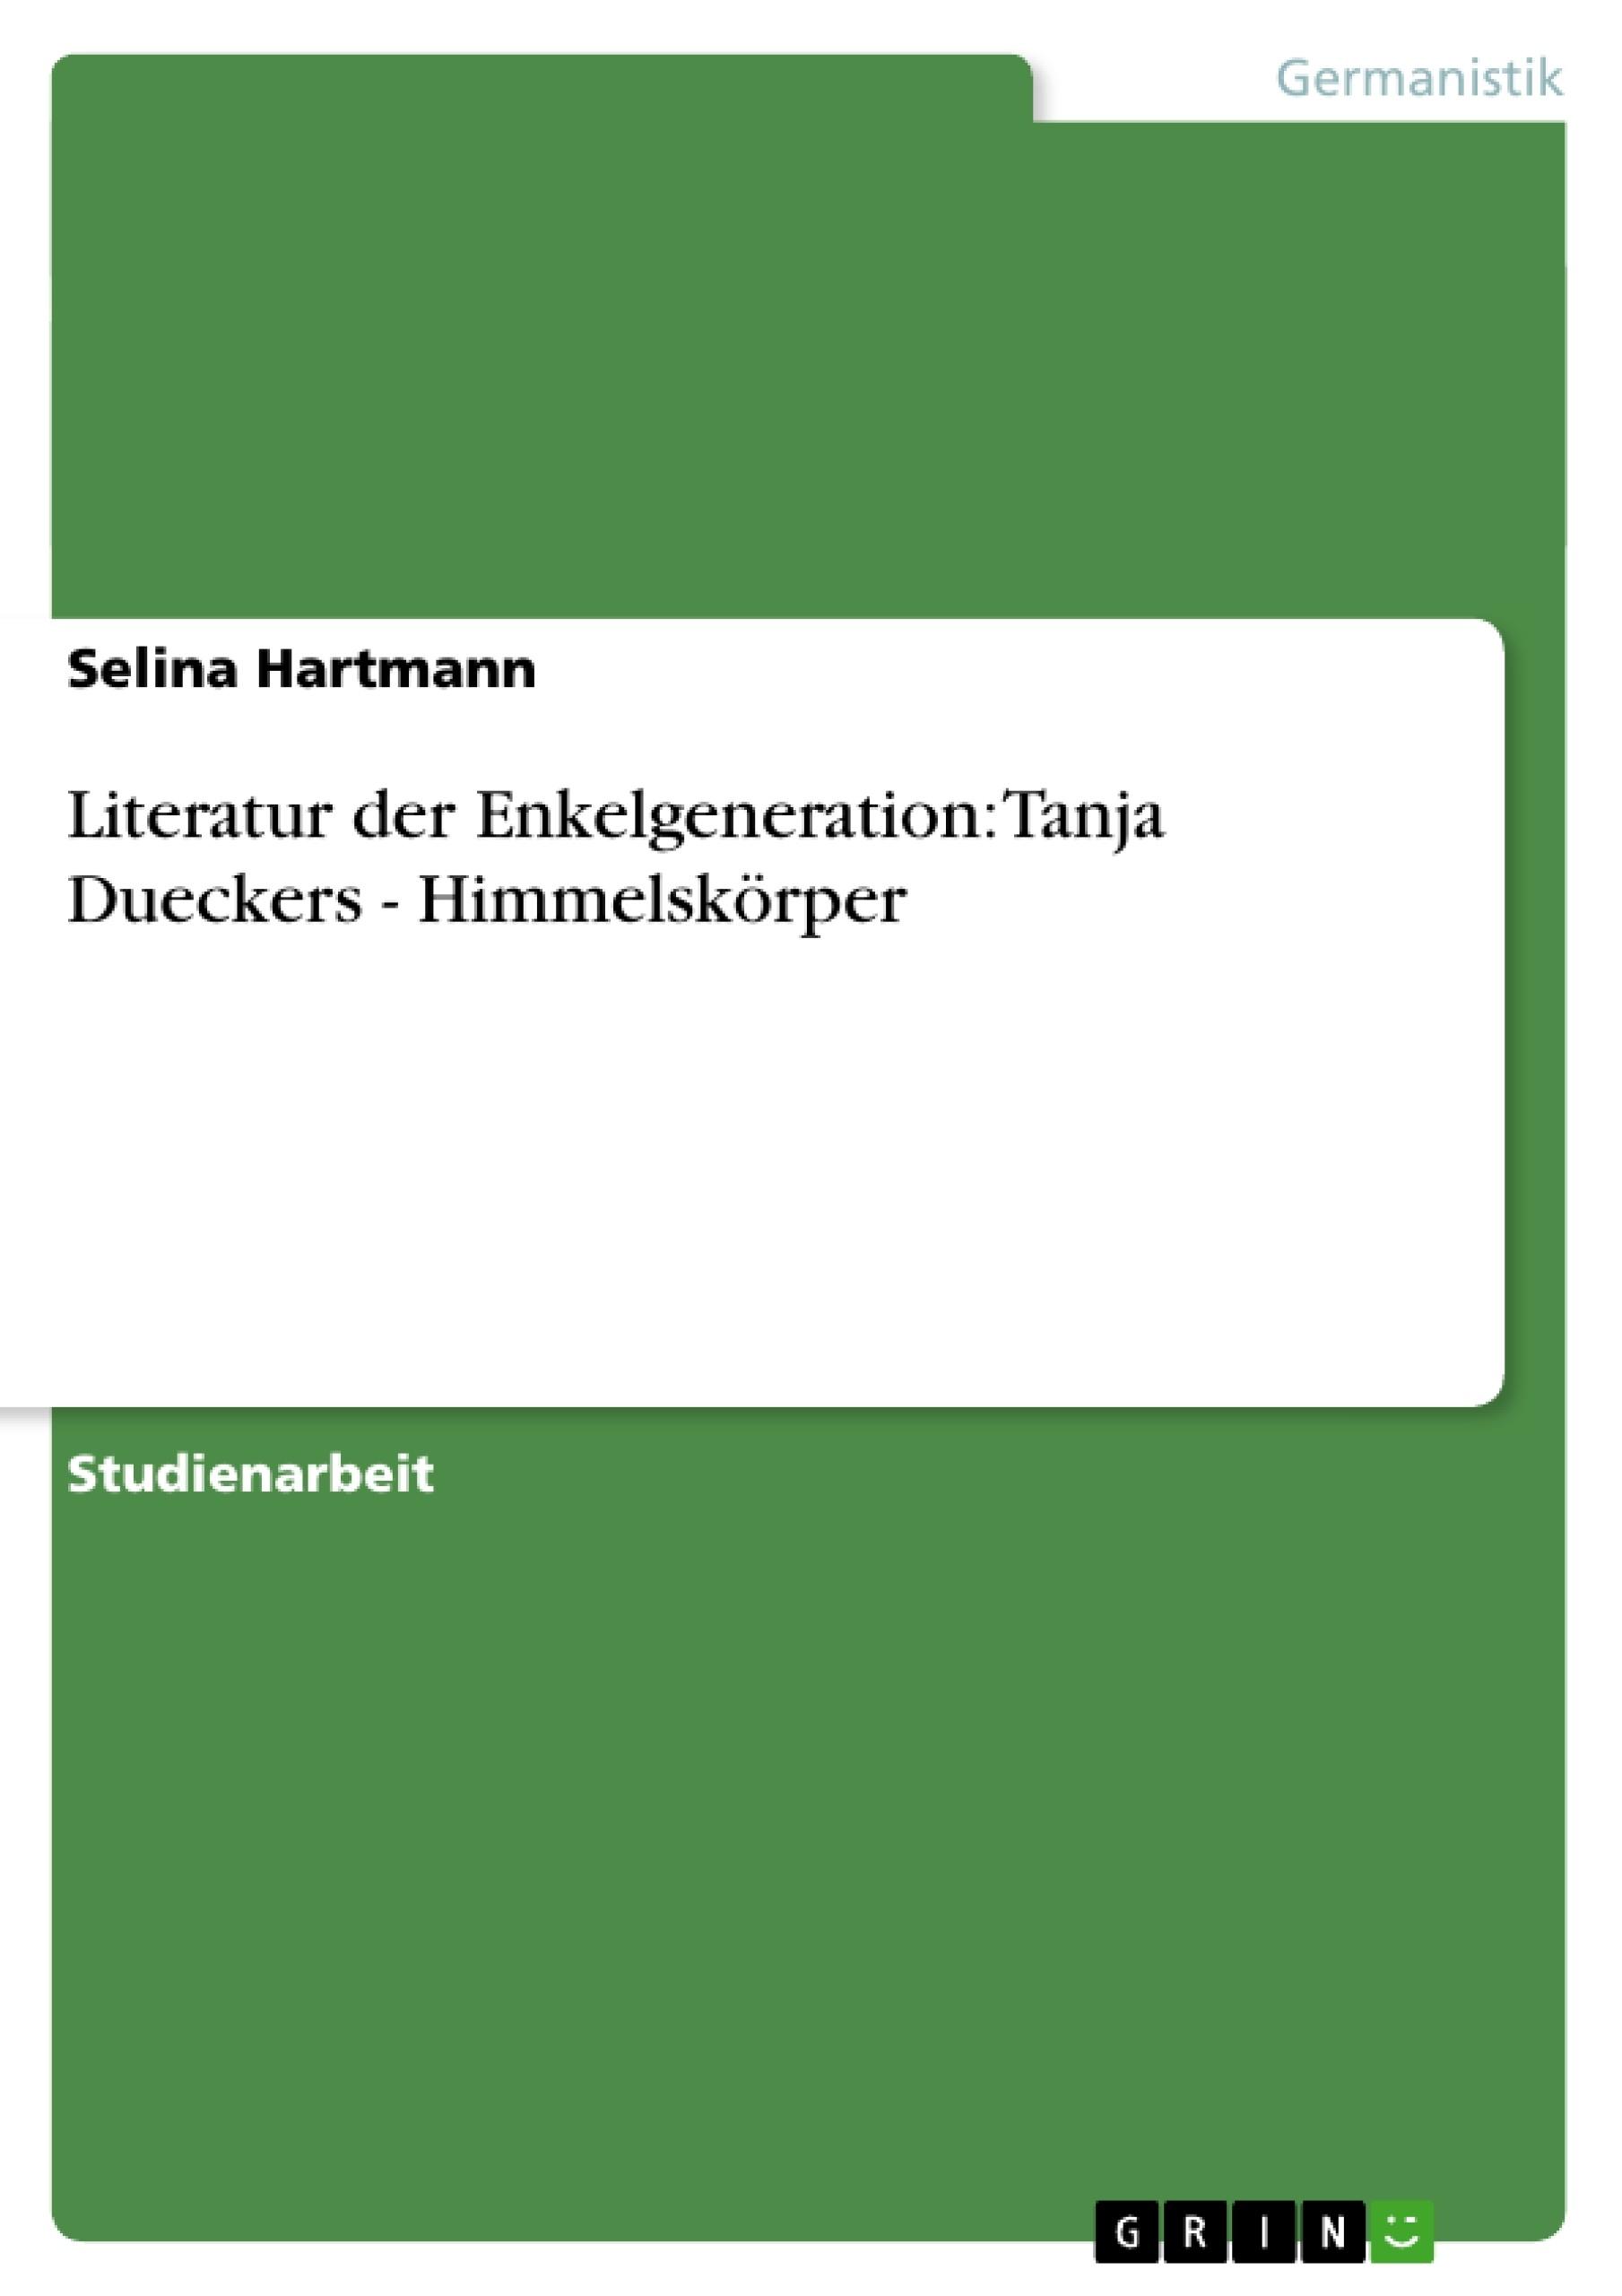 Titel: Literatur der Enkelgeneration: Tanja Dueckers - Himmelskörper